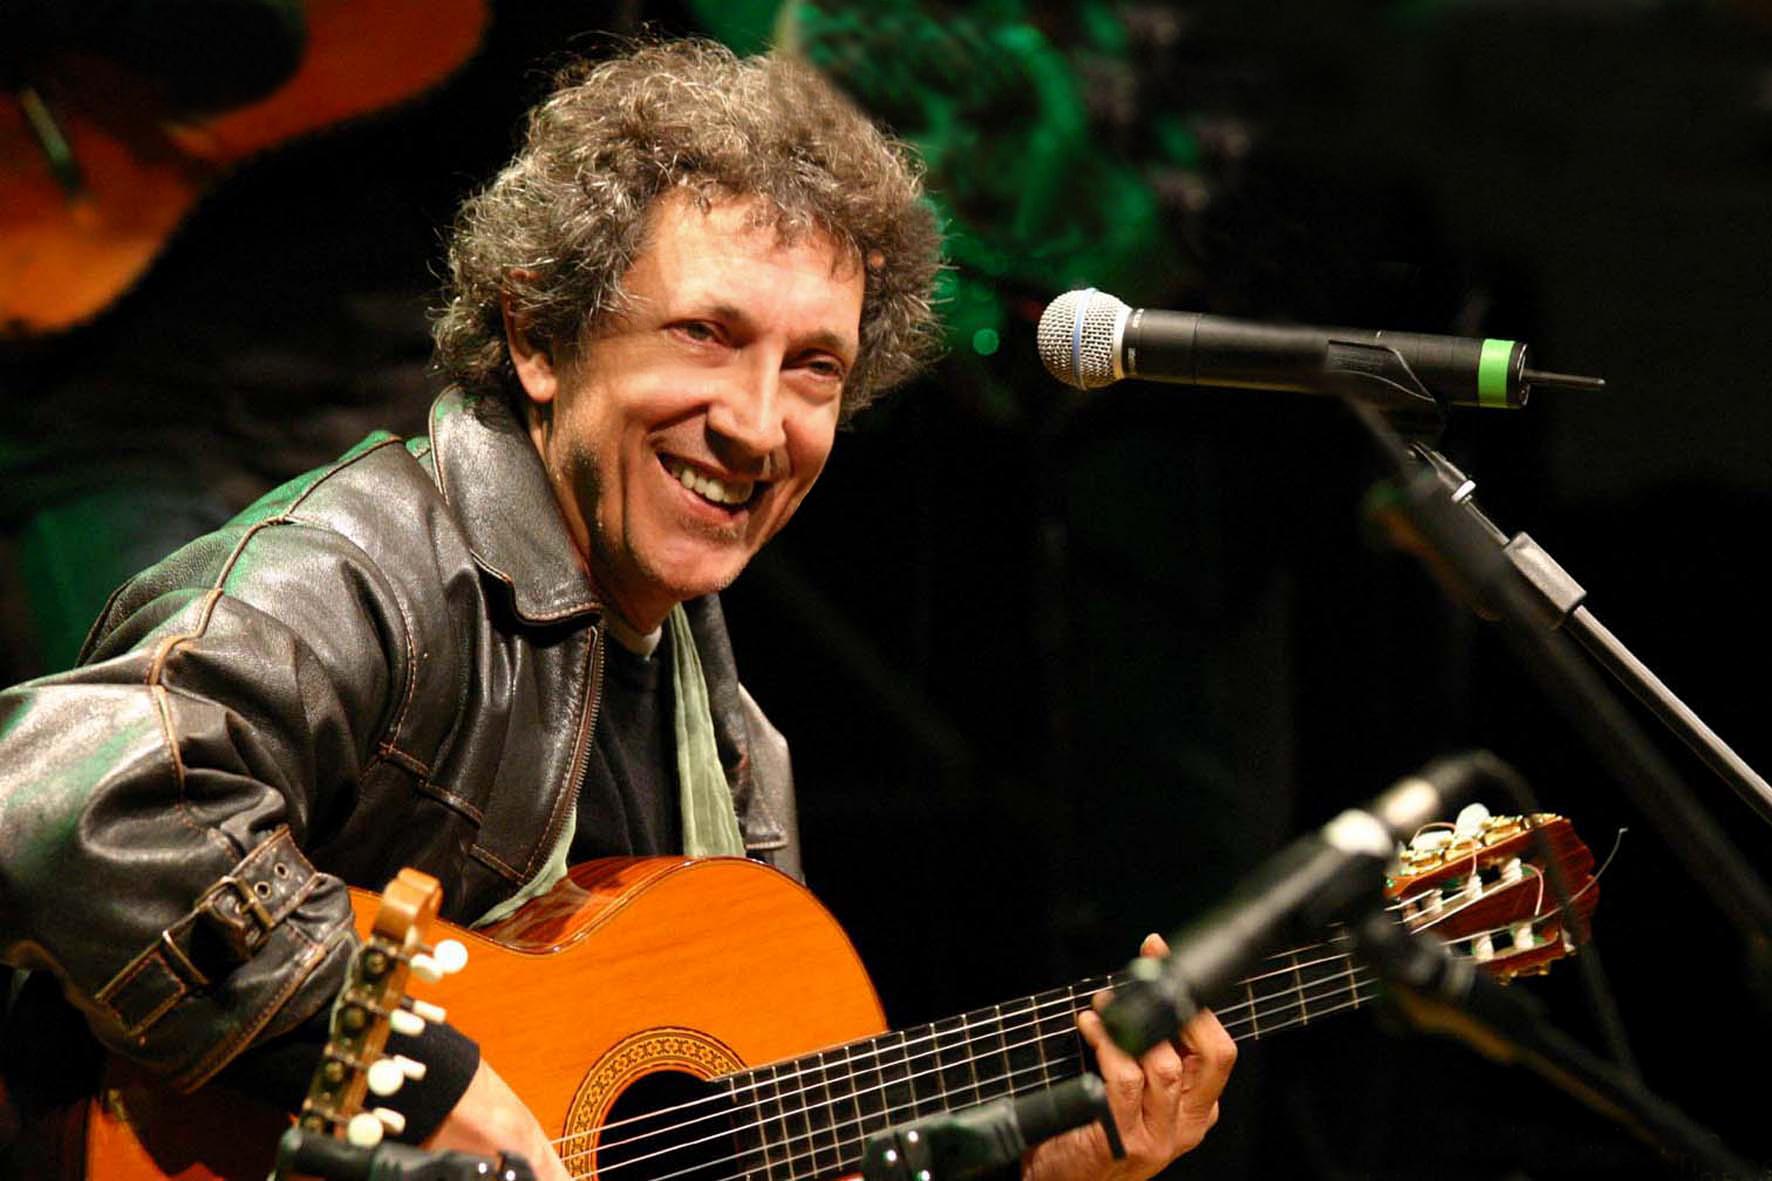 Eugenio Bennato si unisce al Dock of Sounds